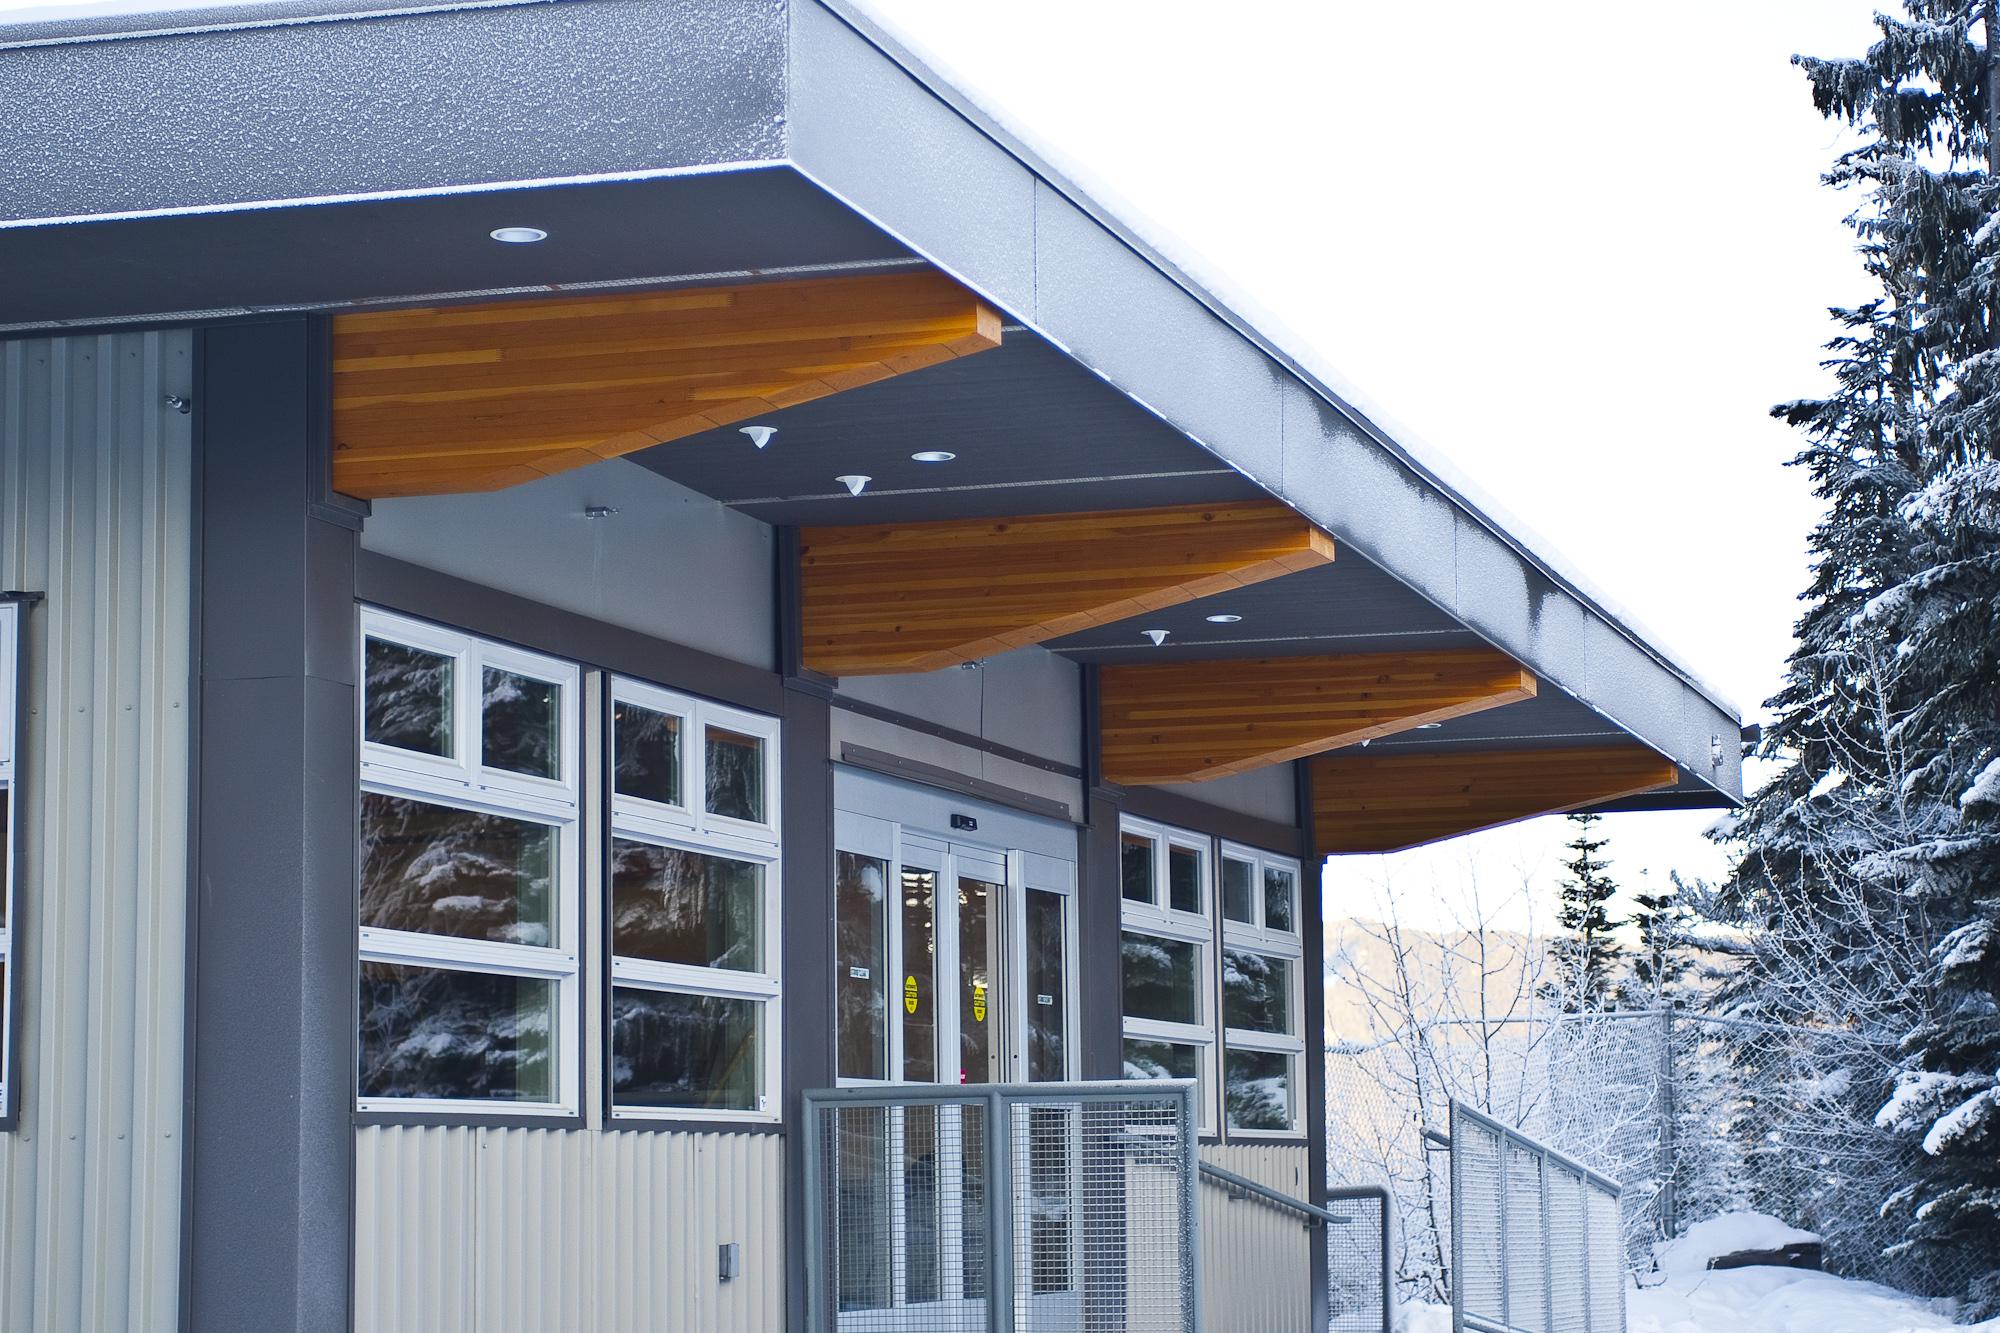 Whistler Adaptive Ski Program